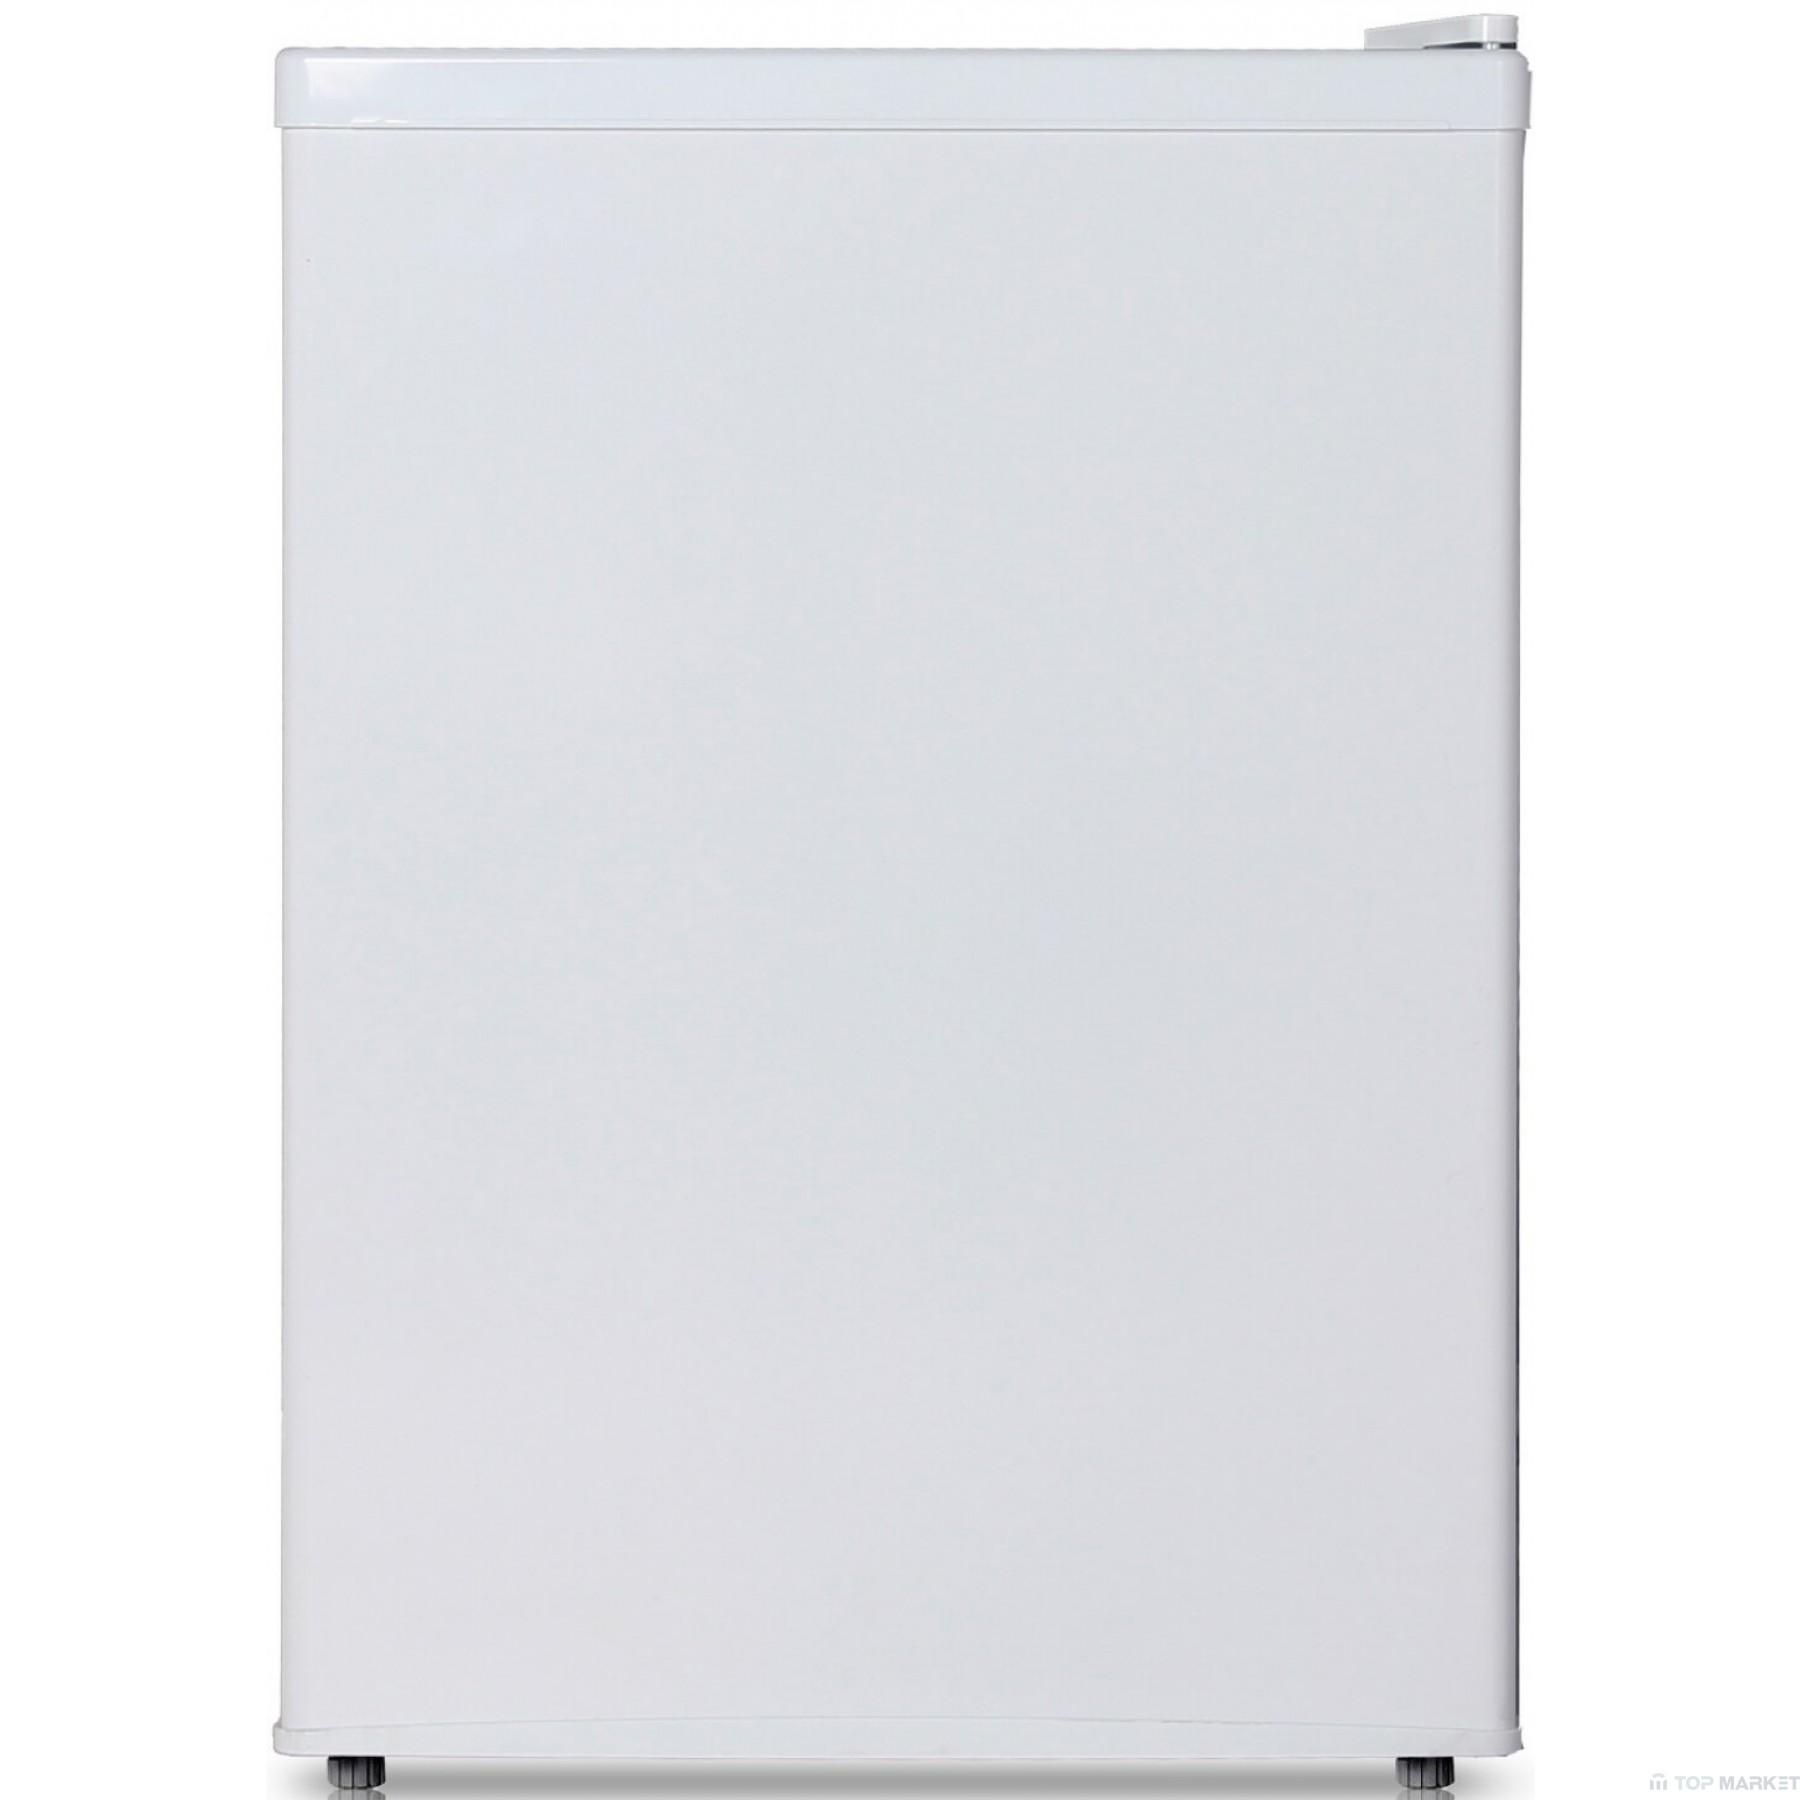 Хладилник ARIELLI ARS 87LN мини бар